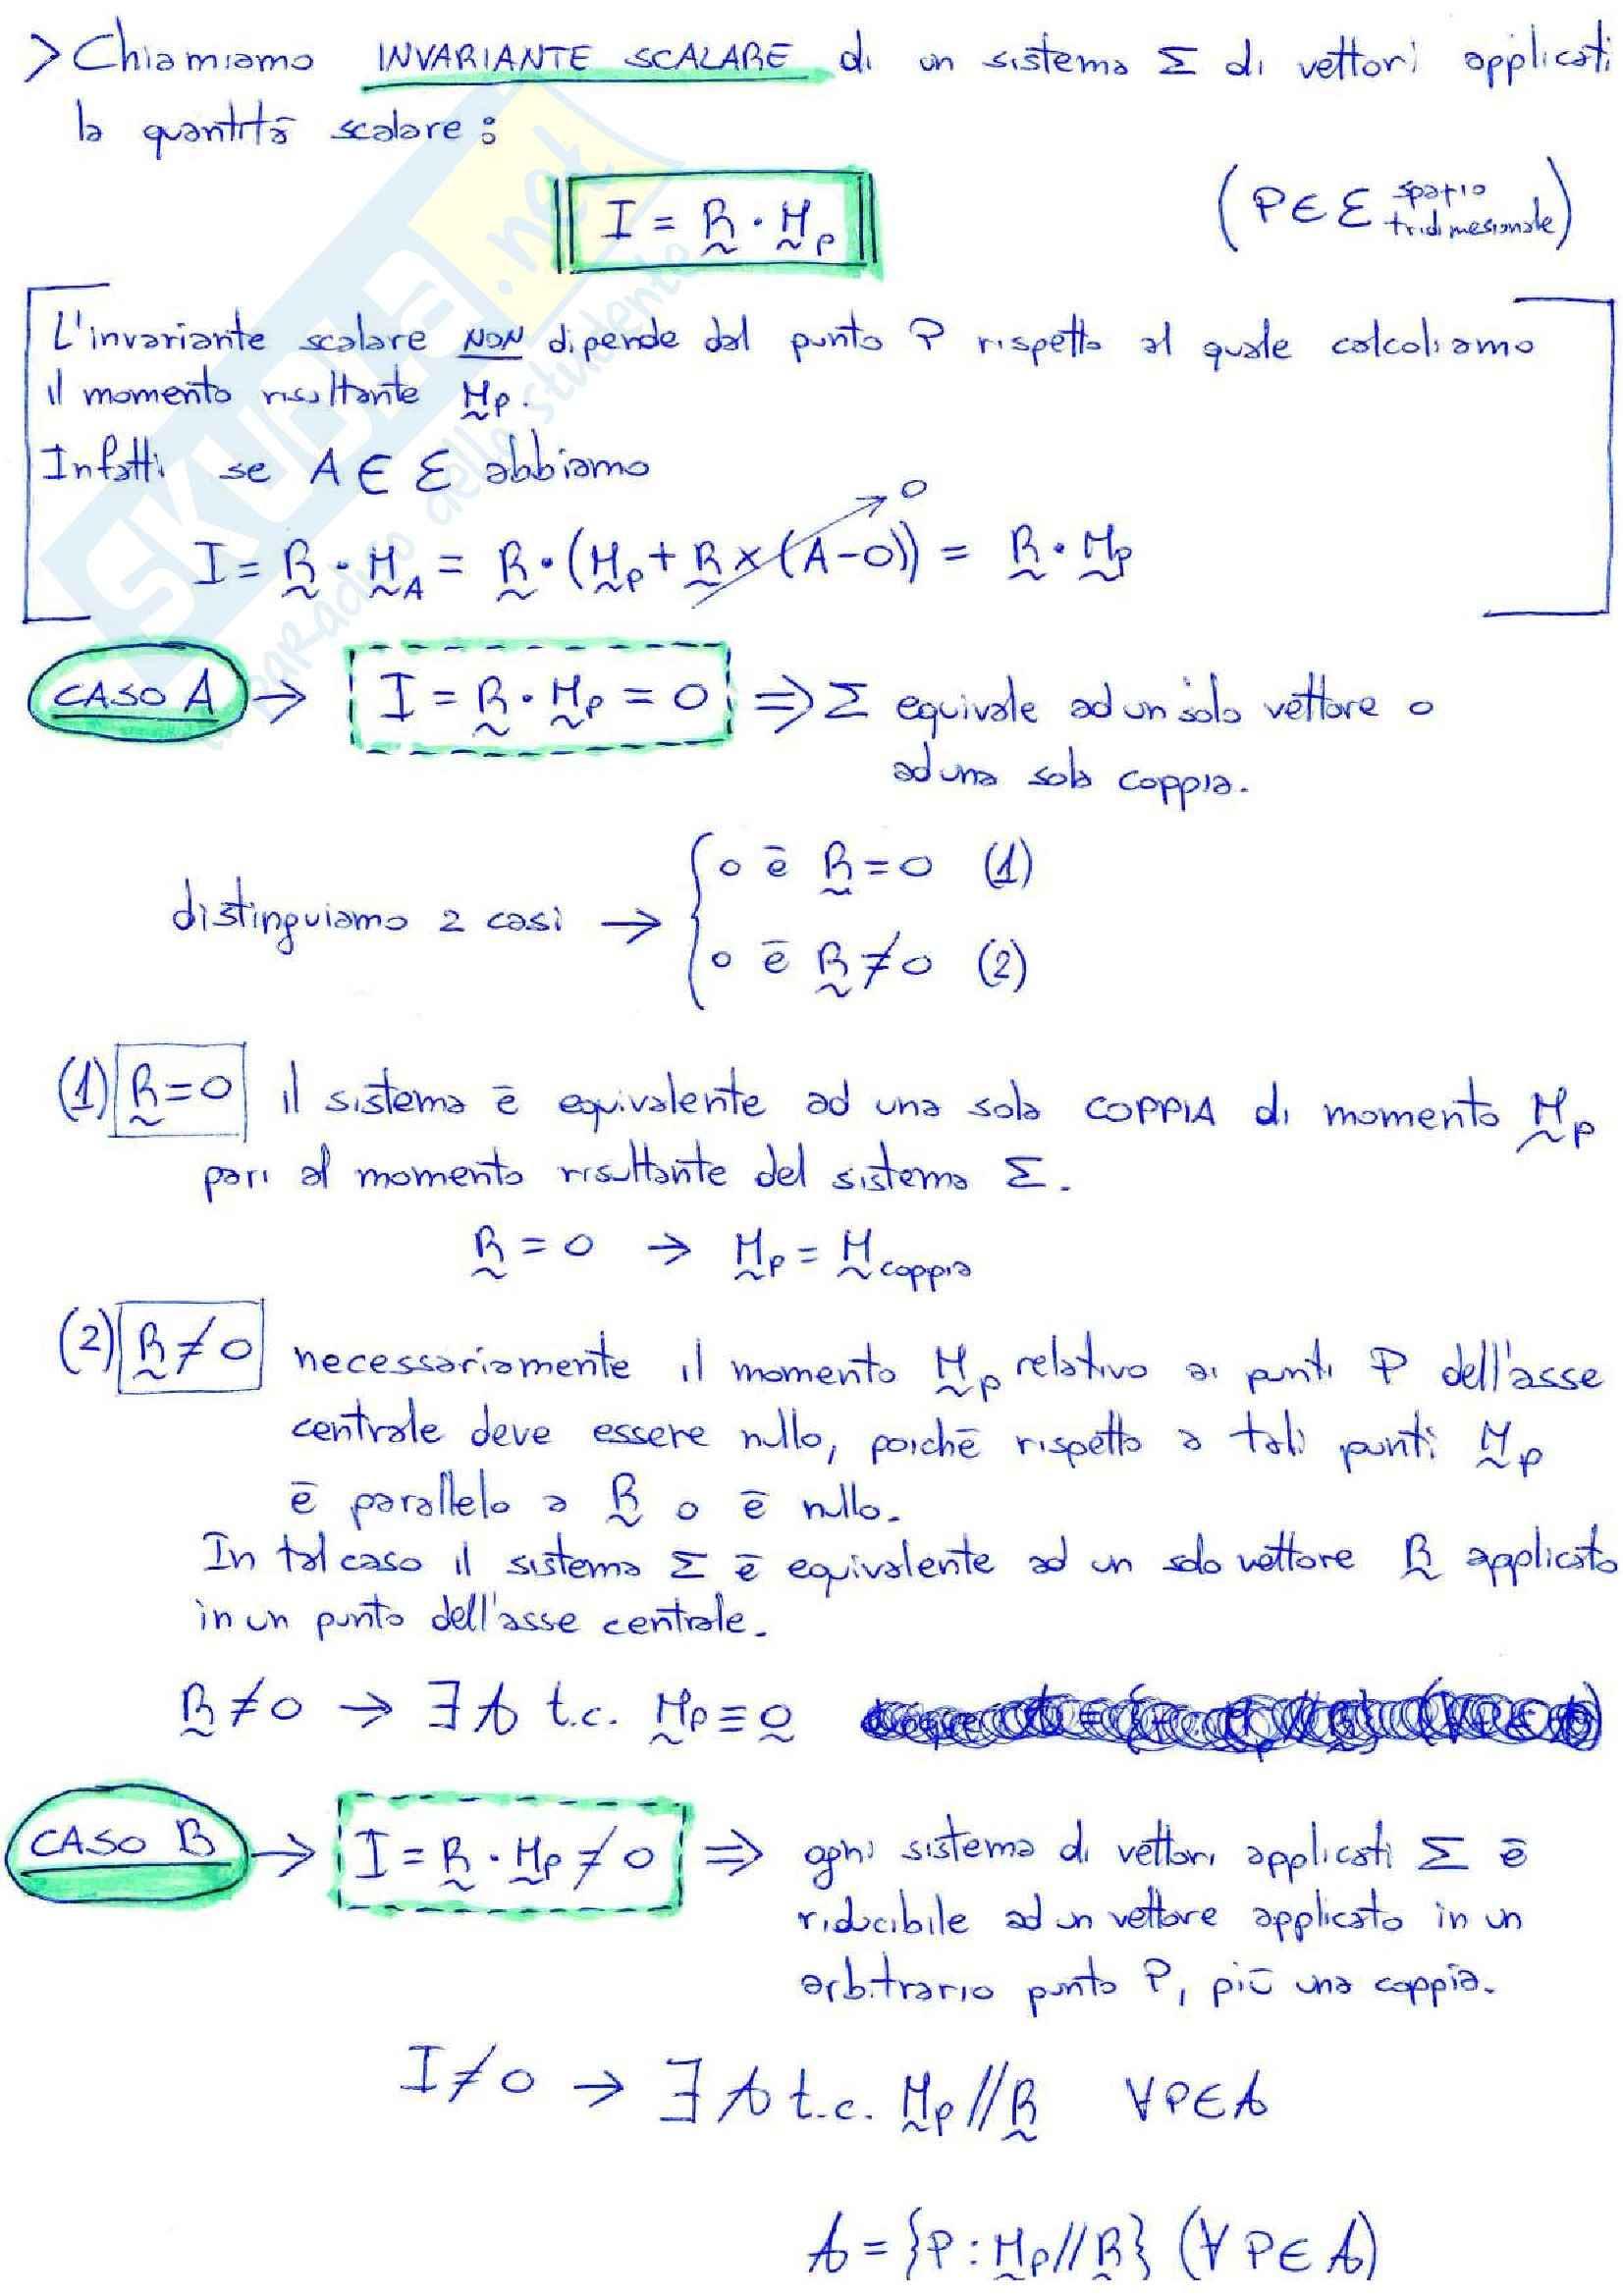 Matematica 3 - Appunti Pag. 2